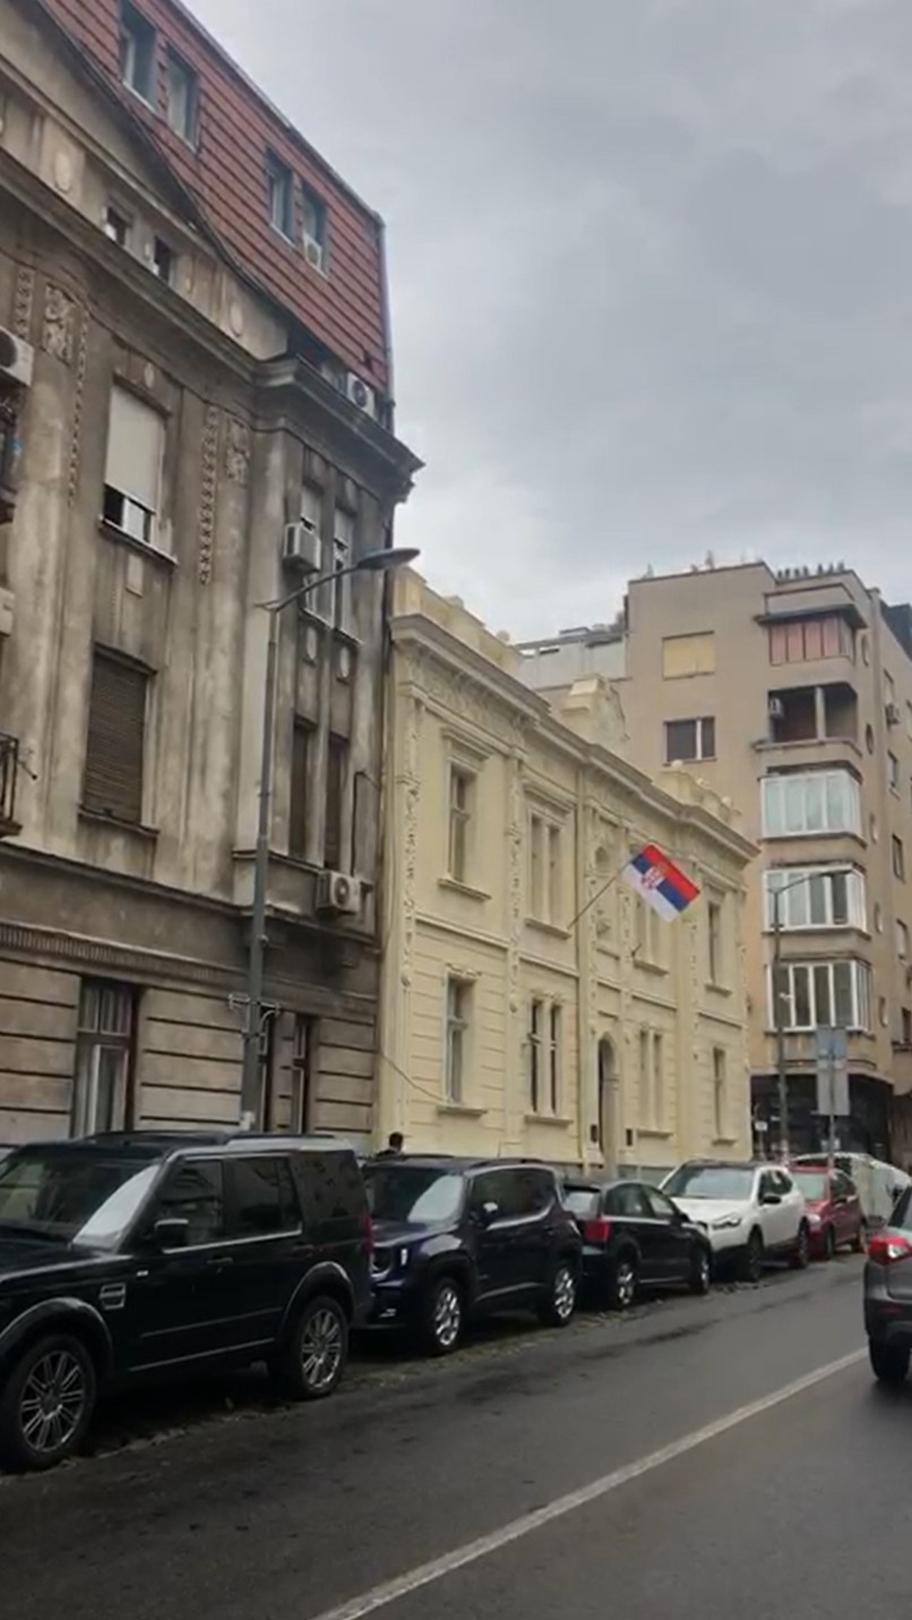 Zgrade koje ce se navodno rusiti na Vracaru